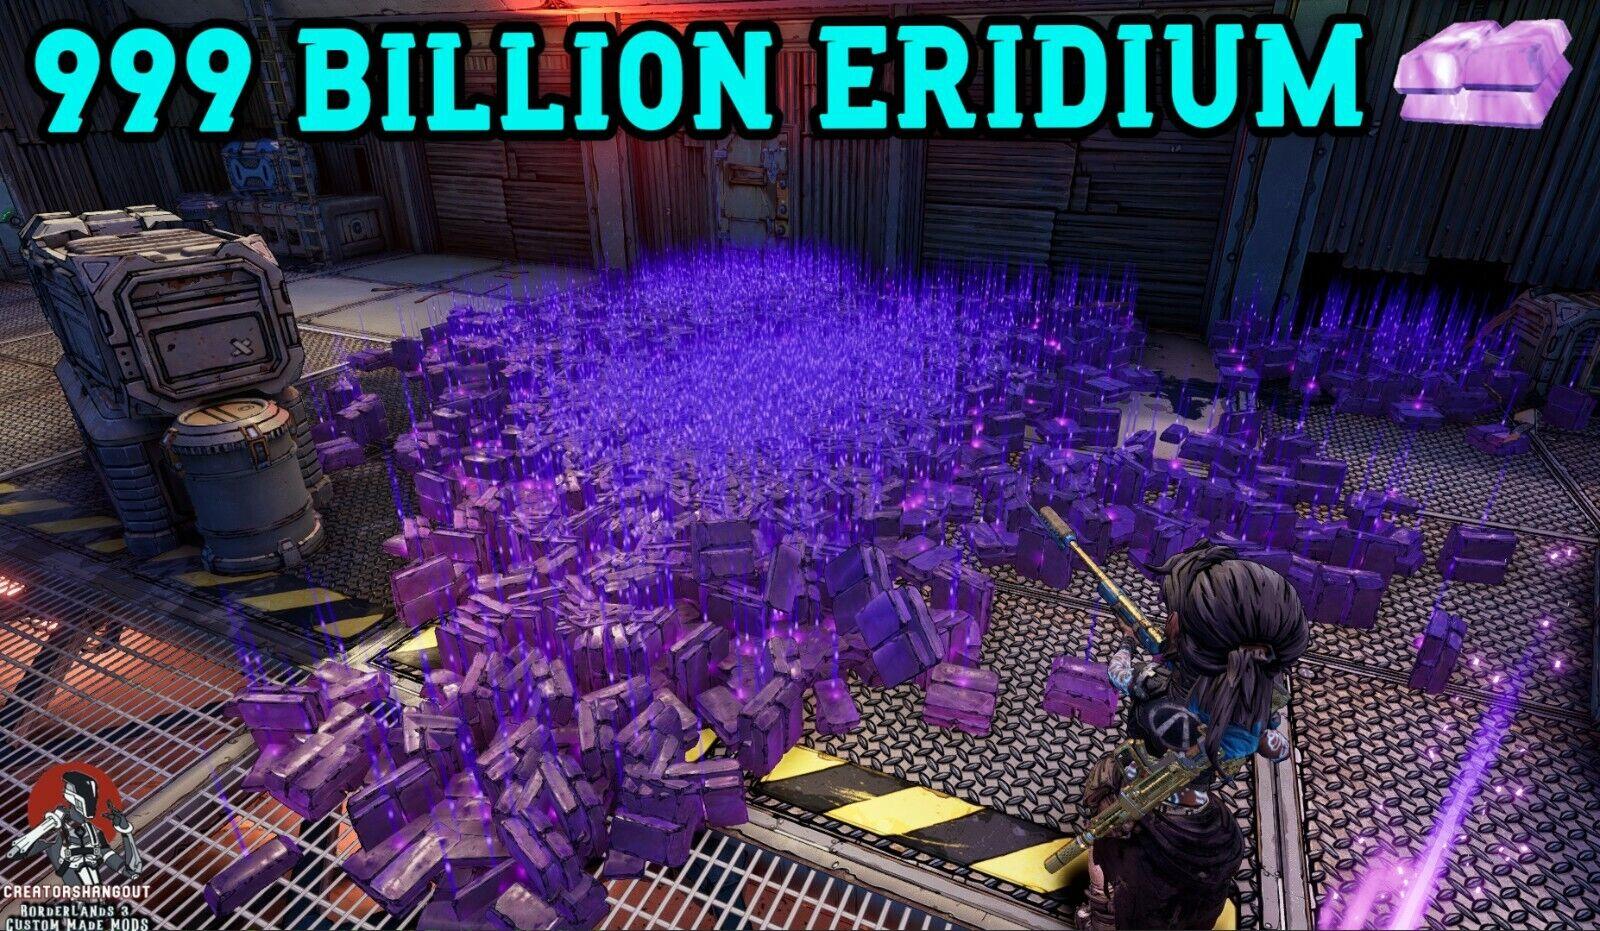 Borderlands 3 Modded 99 BILLION ERIDIUM ⚛️Instantly Max Eridium - PC Stadia XBOX